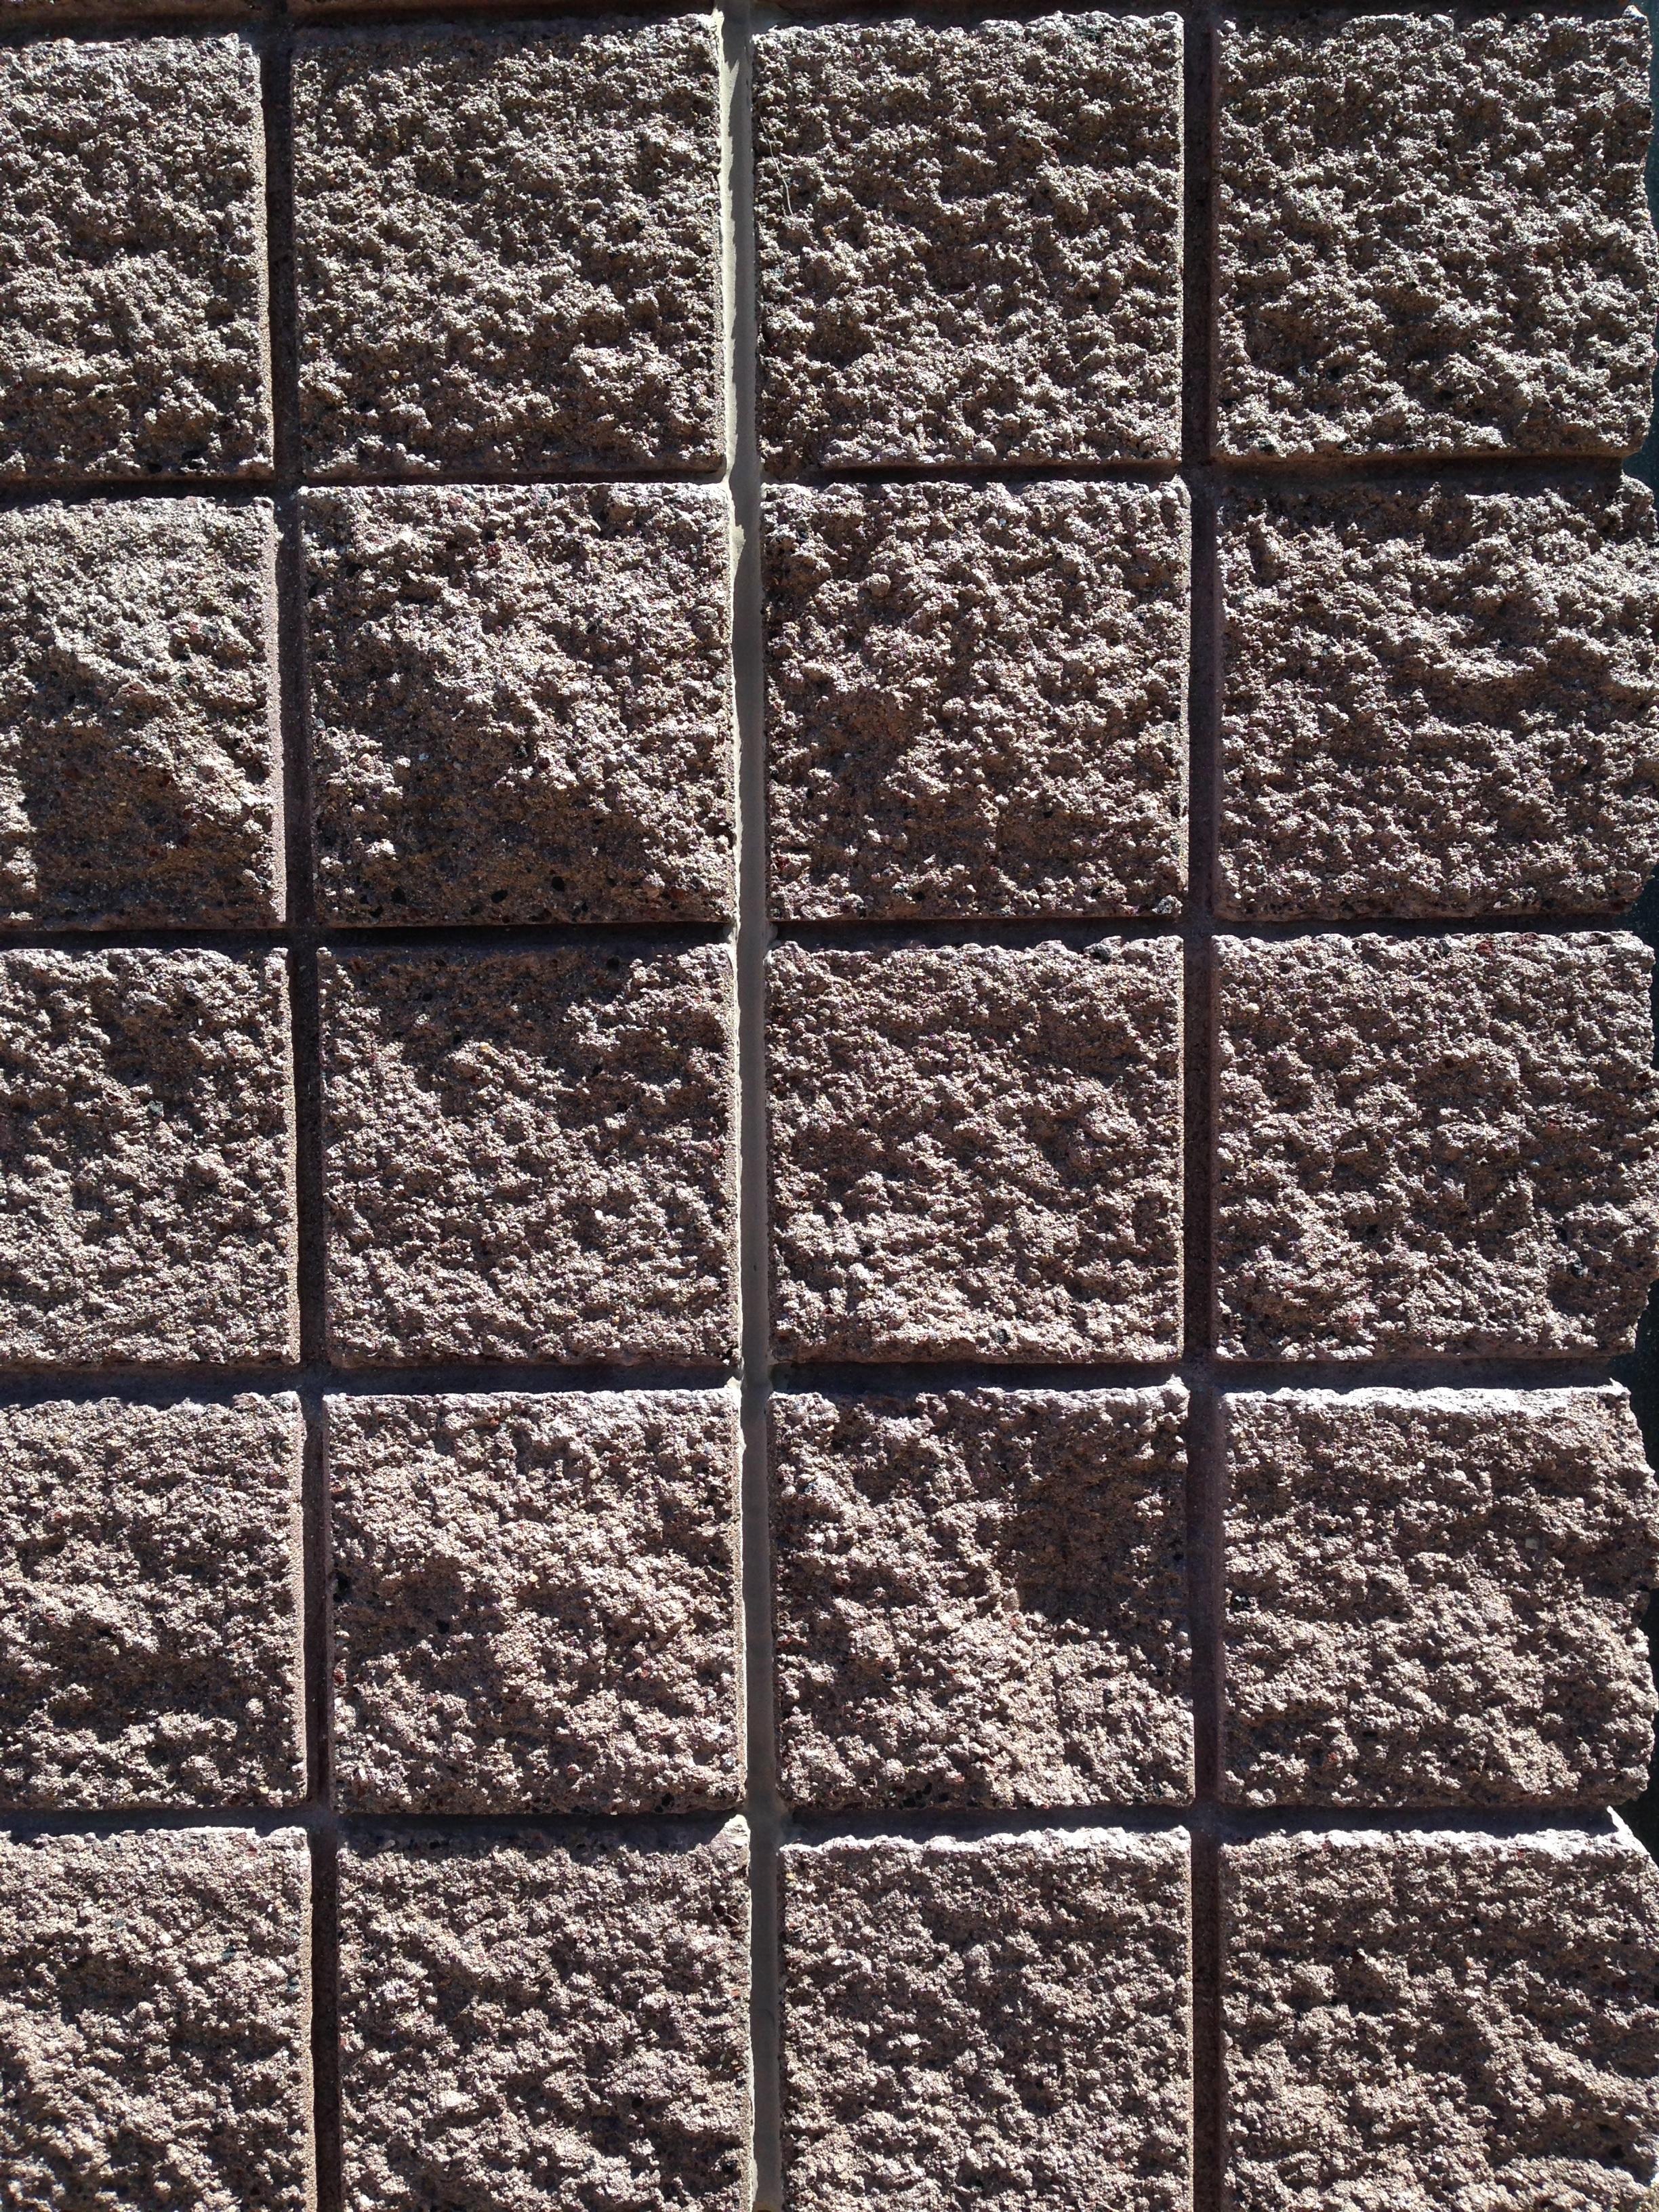 Free Images Rock Wood Texture Floor Cobblestone Line Soil